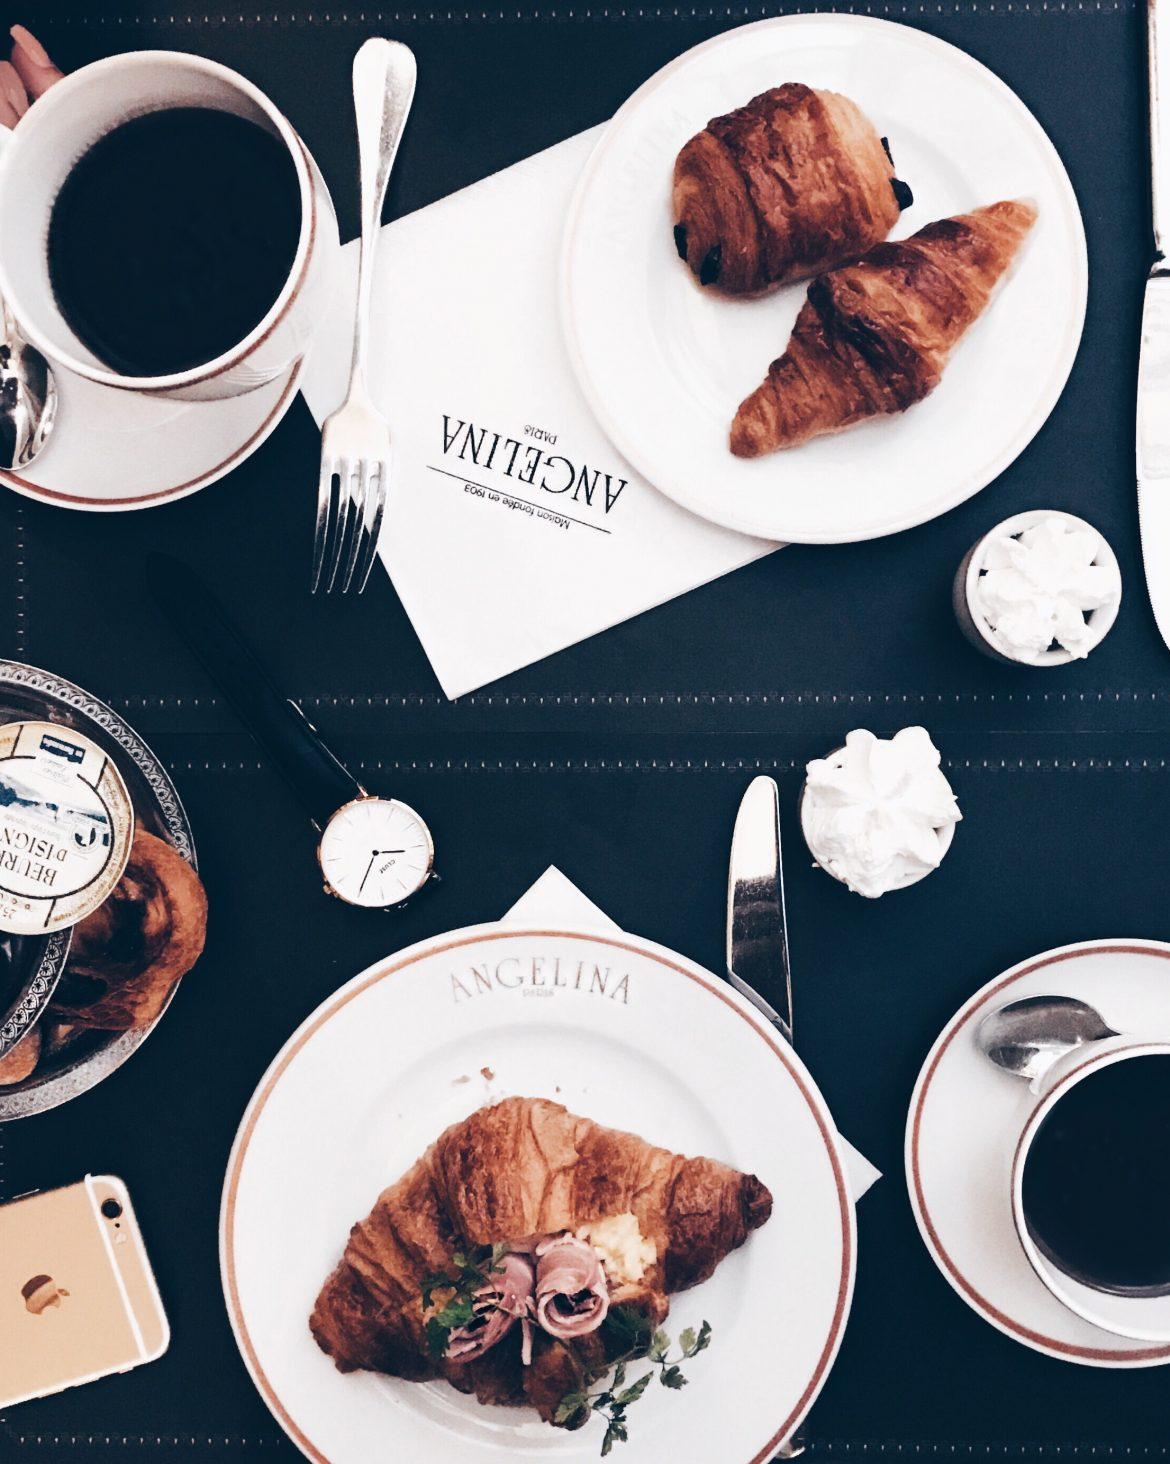 Café da manhã - Croissant - Angelina Paris - Kezia Happuck